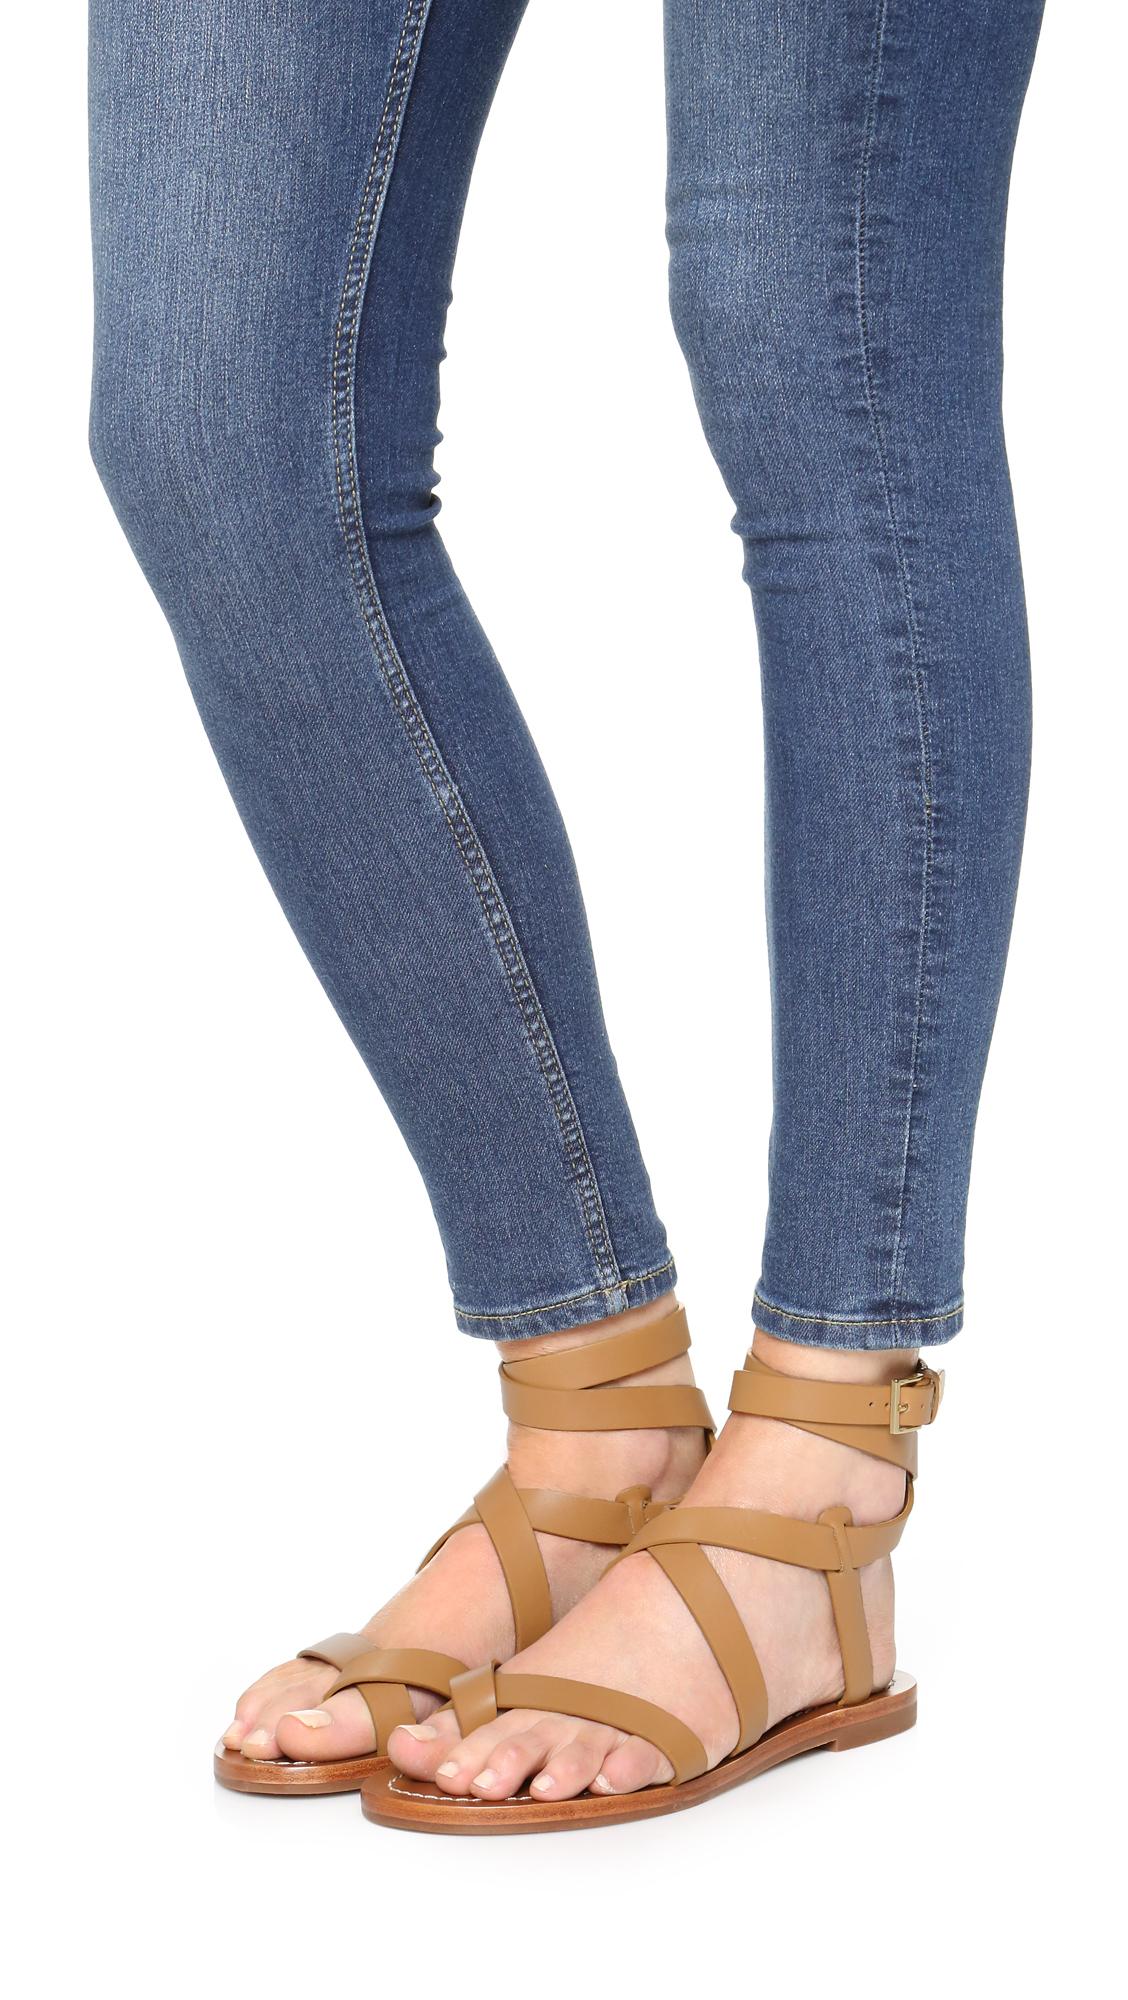 1ba8c35f0045 Tory Burch Patos Sandals